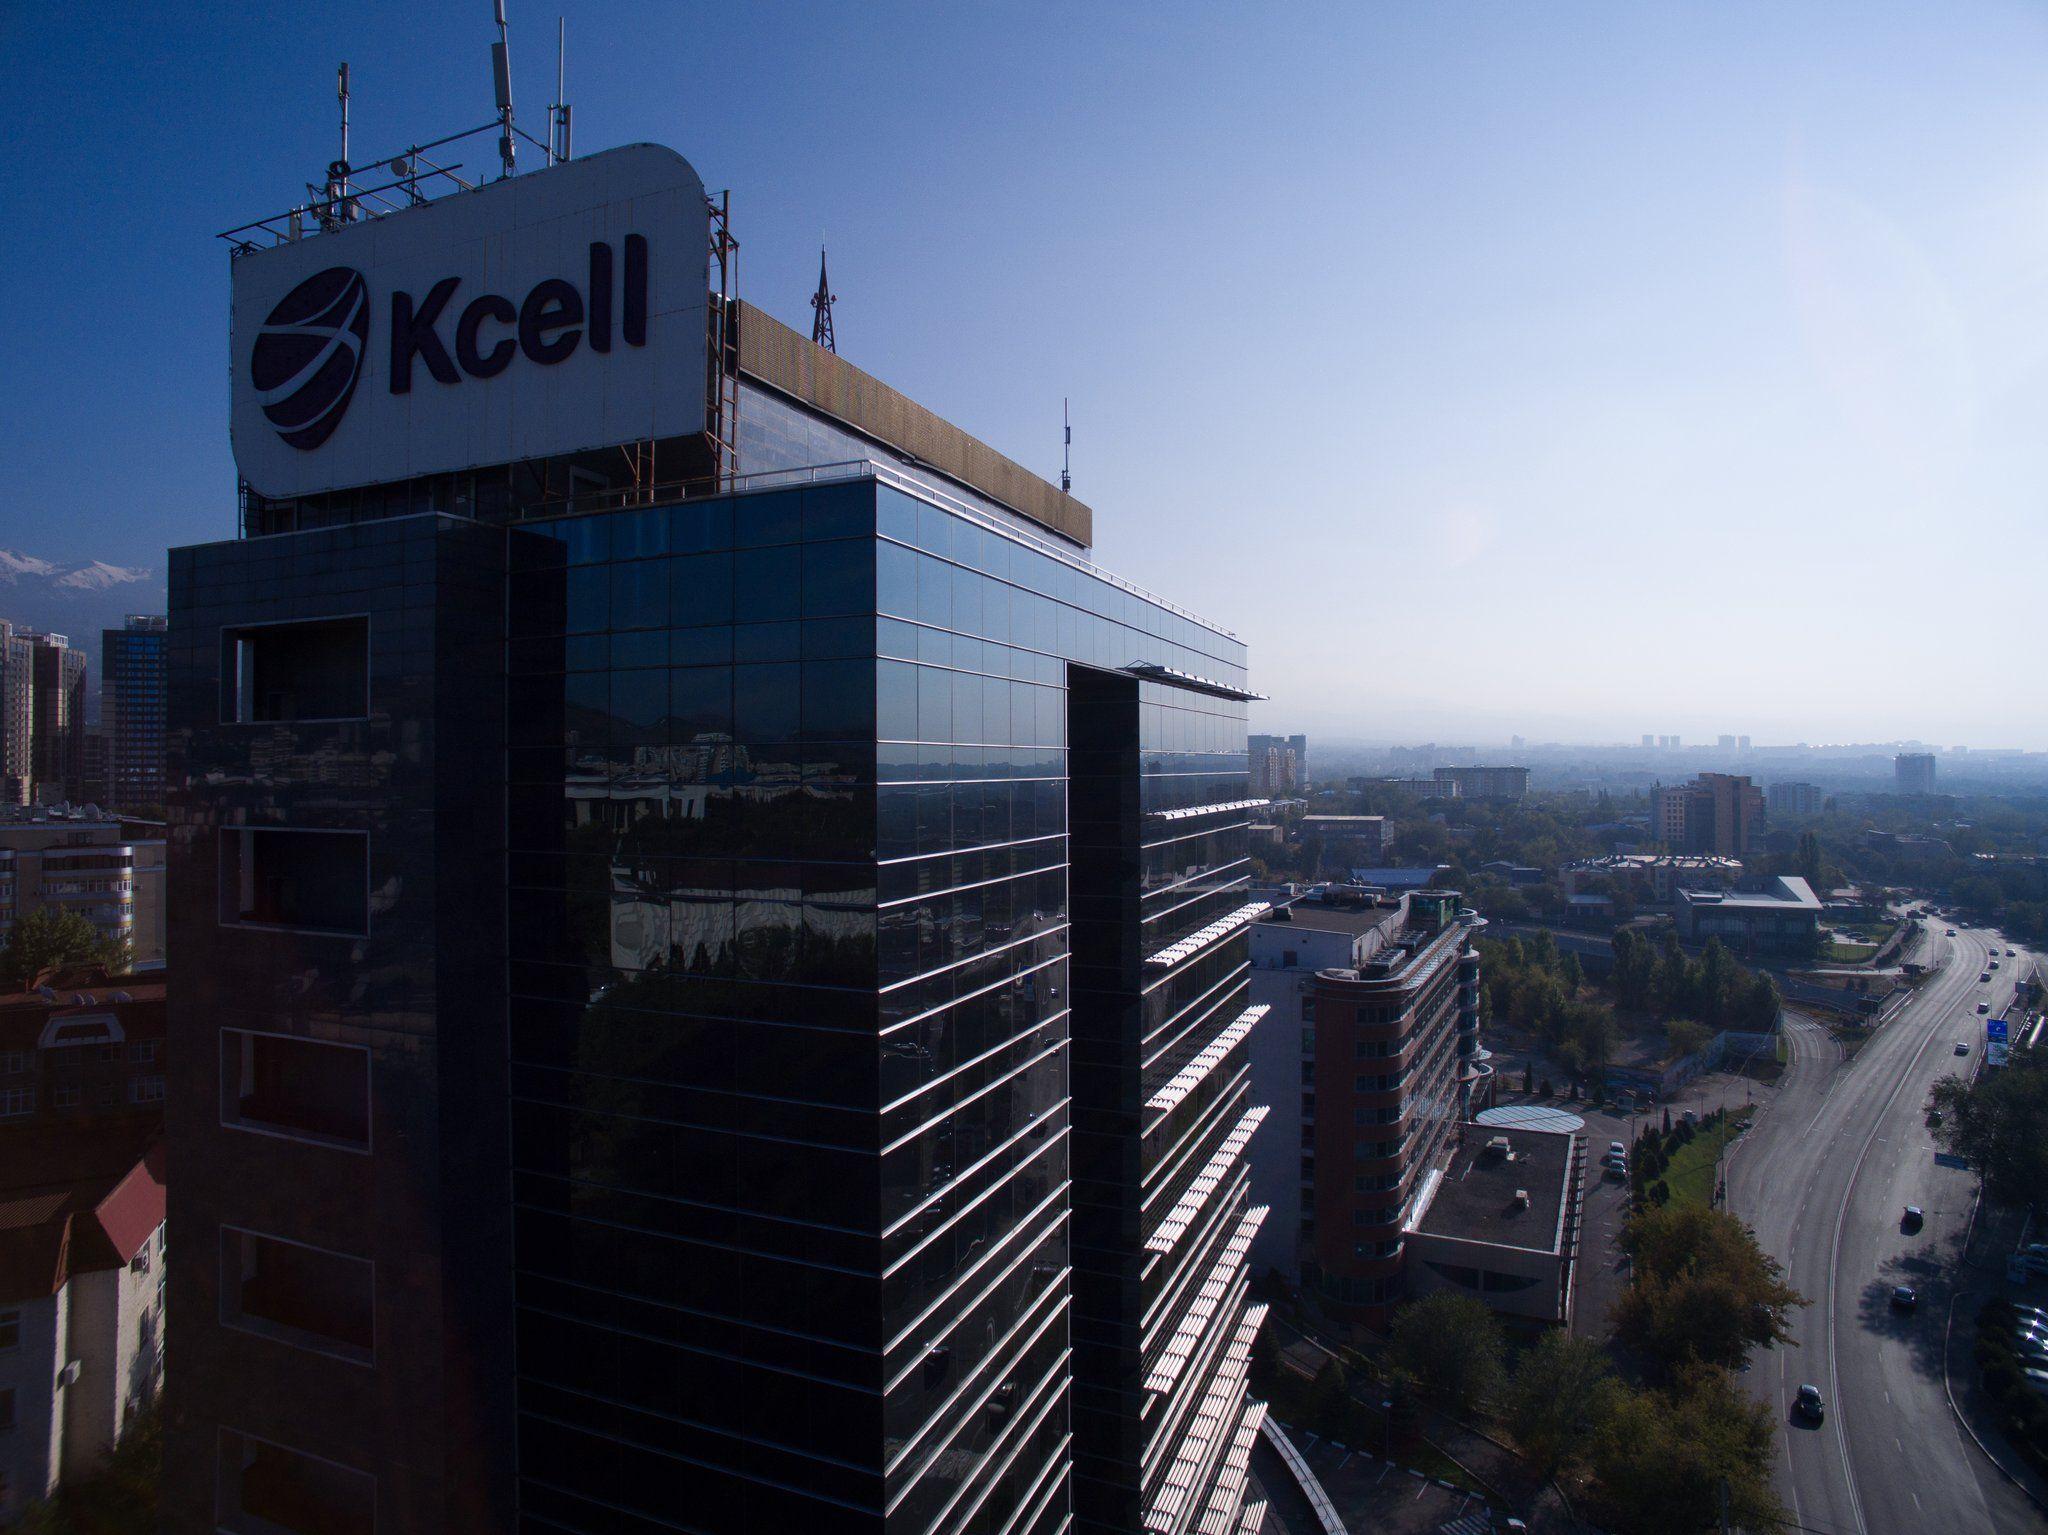 Кселл подвел итоги развития сети в 1 квартале 2019 года - Kapital.kz